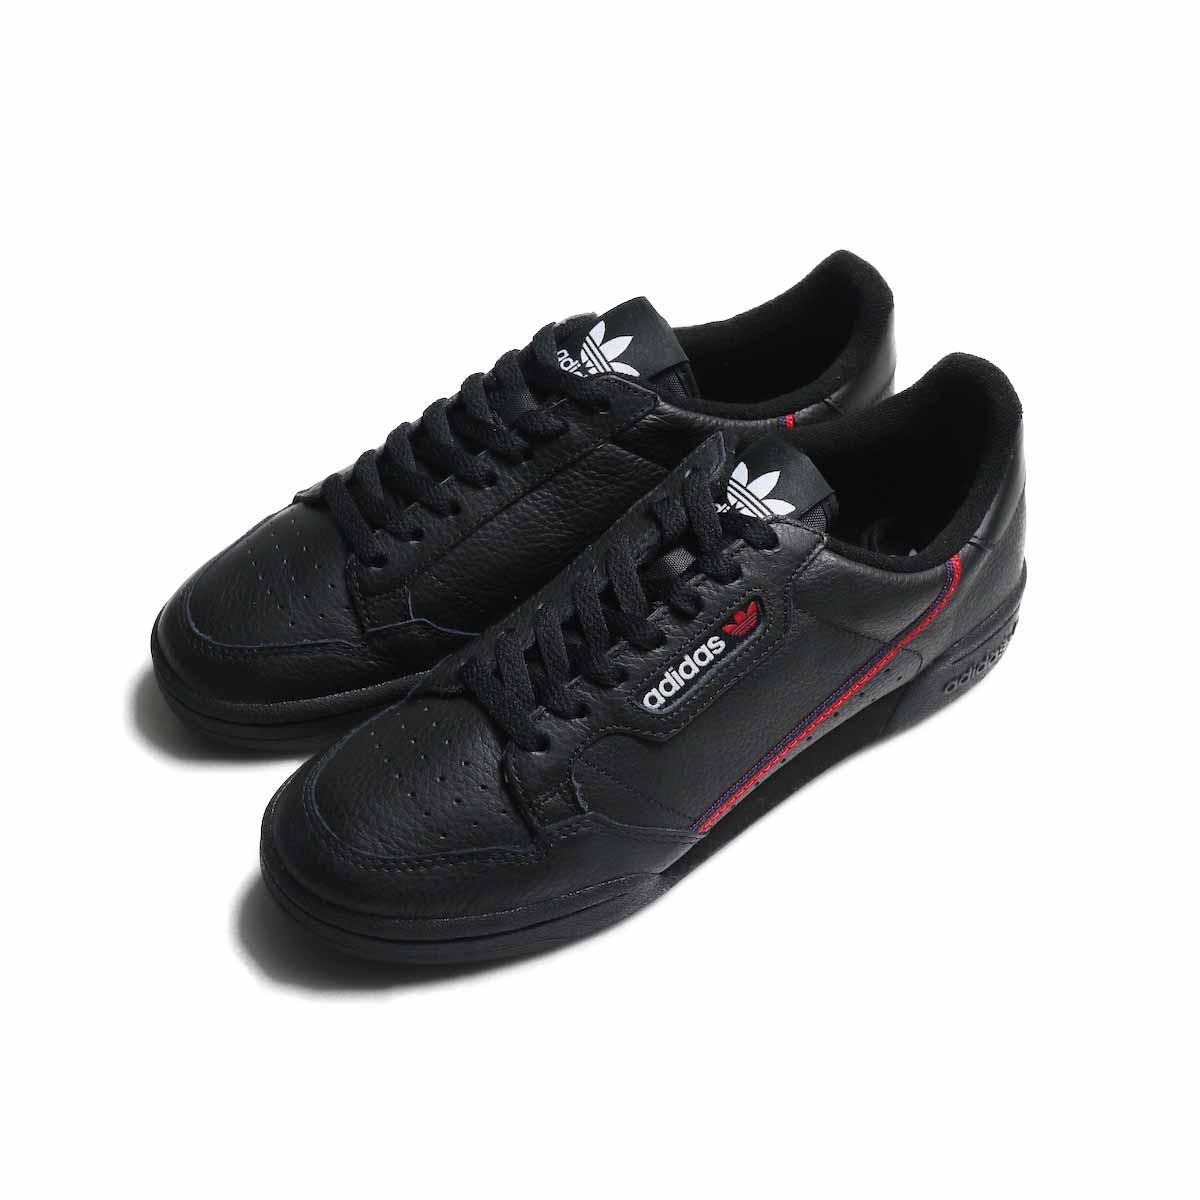 adidas originals / CONTINENTAL80 (G27707) -Black サイド